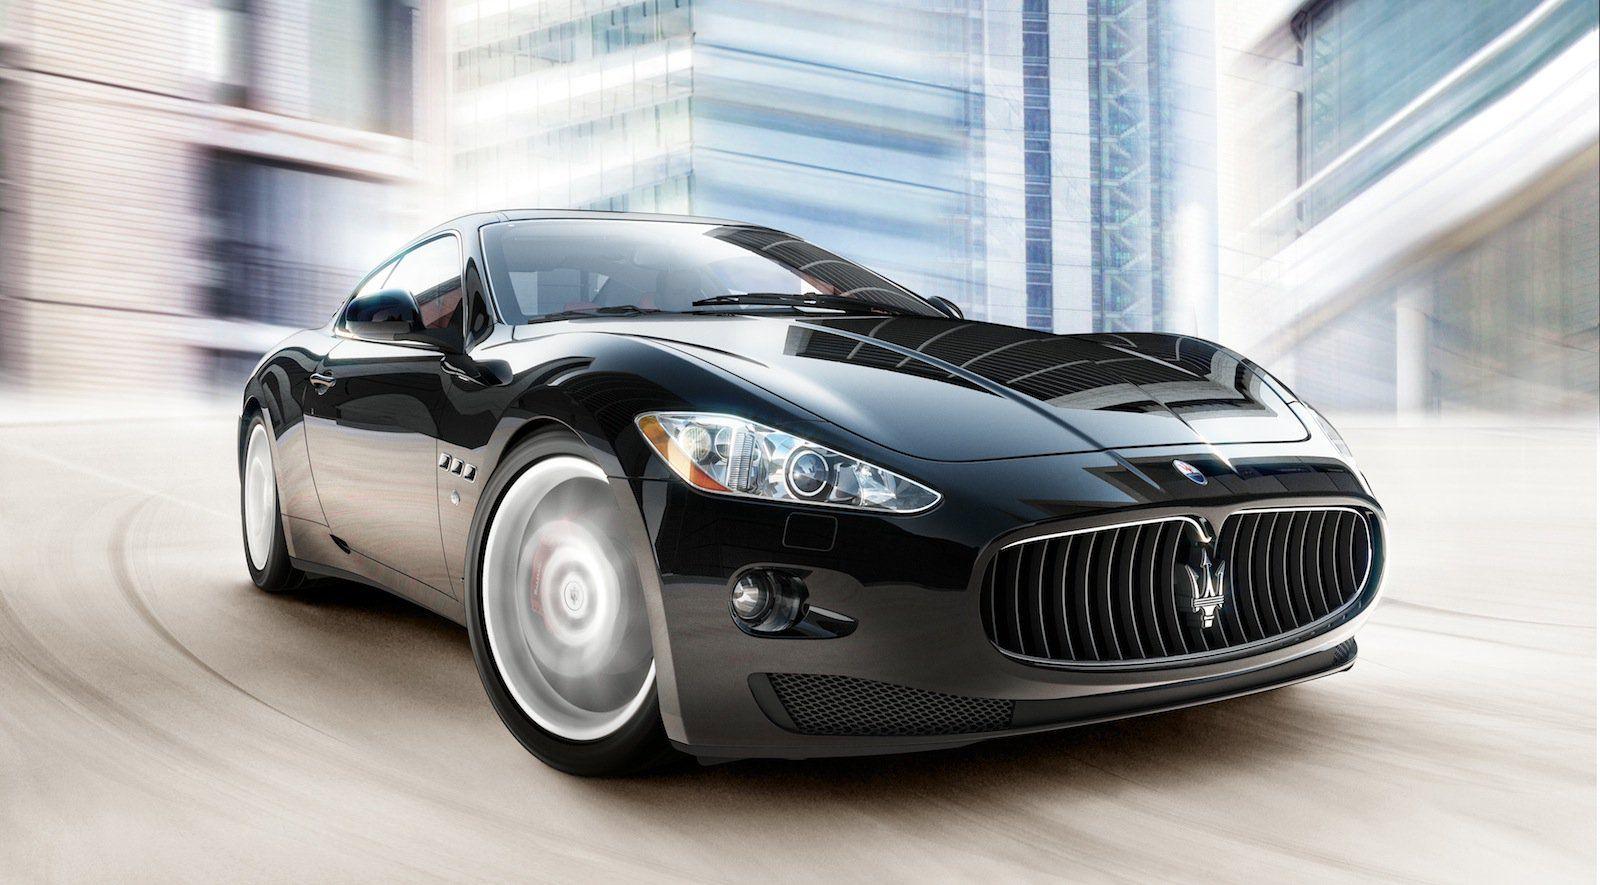 Top 10 Luxury Cars To Attract Women Luxury Car Brands Maserati Maserati Granturismo